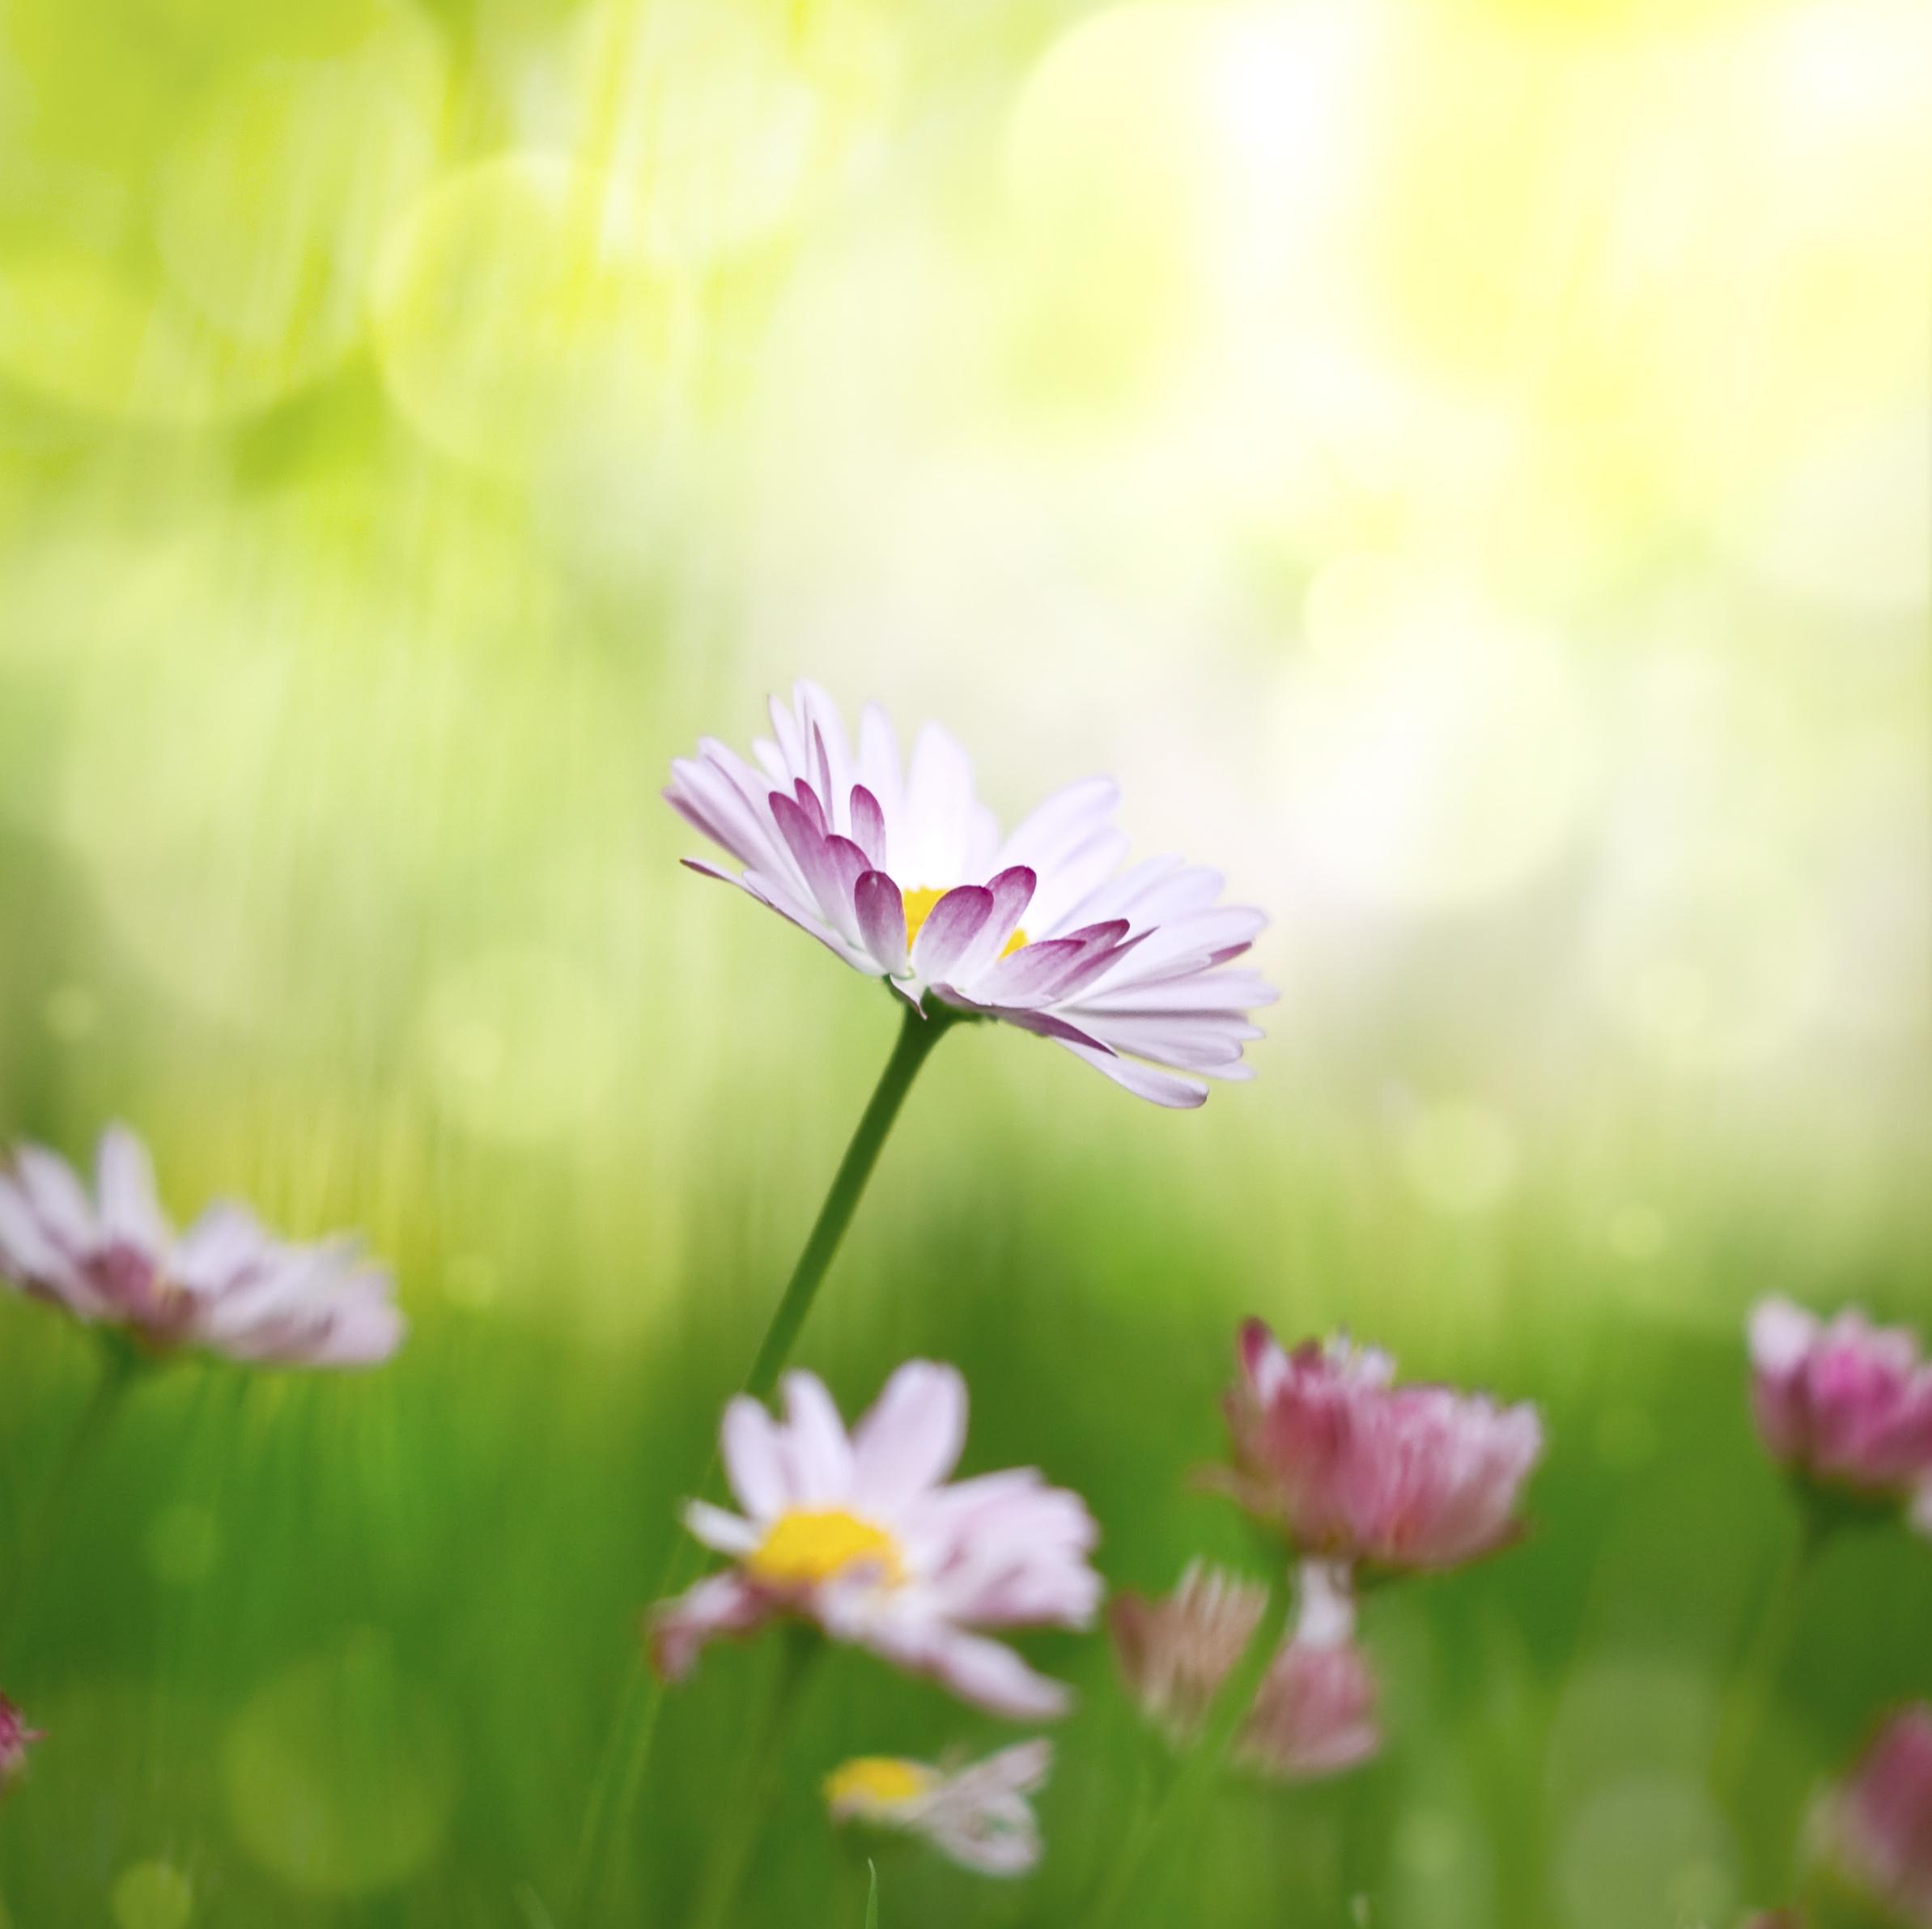 Flower daisy 59849518_Large.jpg